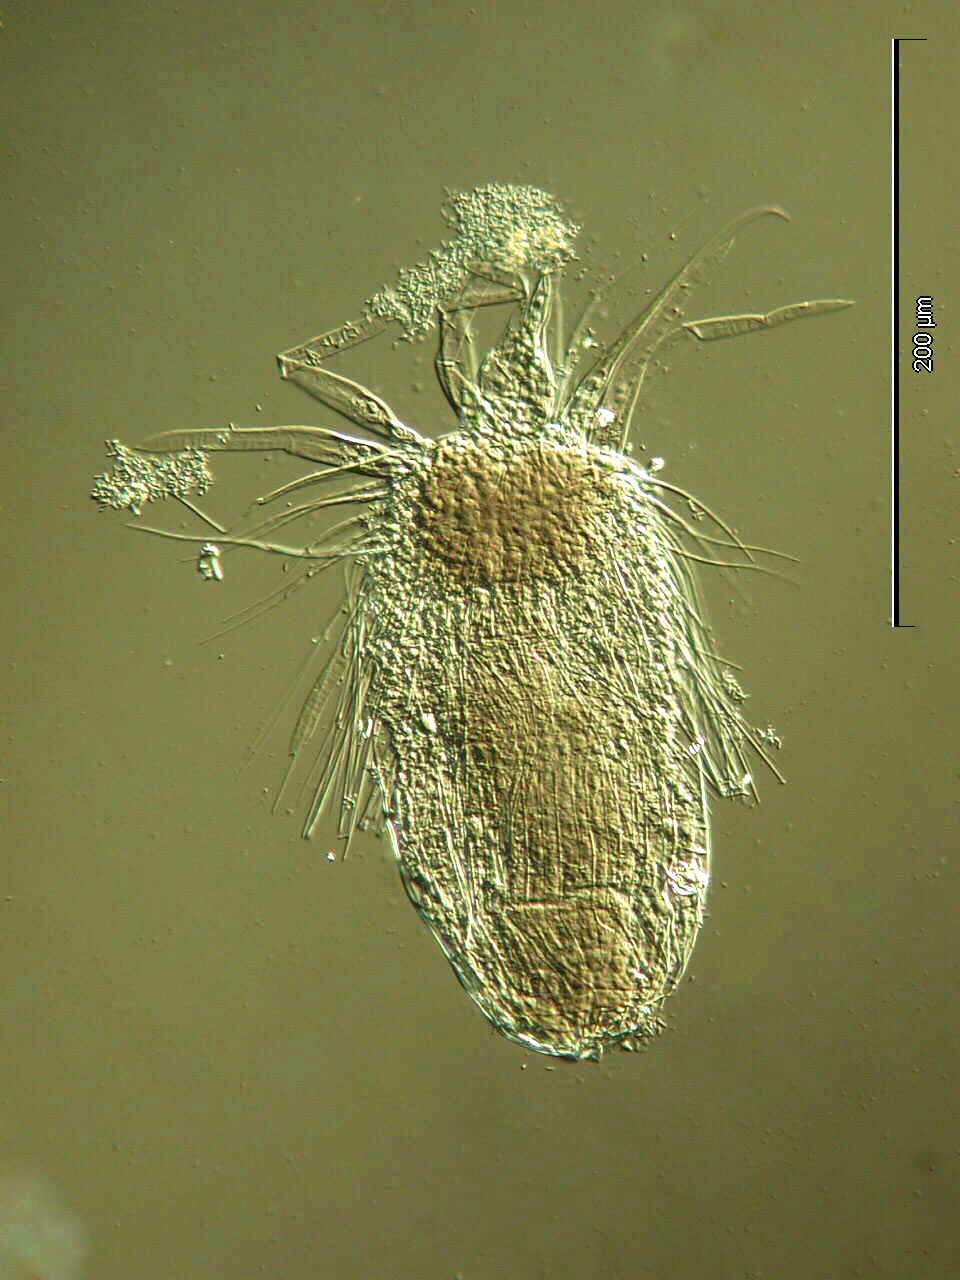 <CITE>Pliciloricus shukeri</CITE> adult JPEG